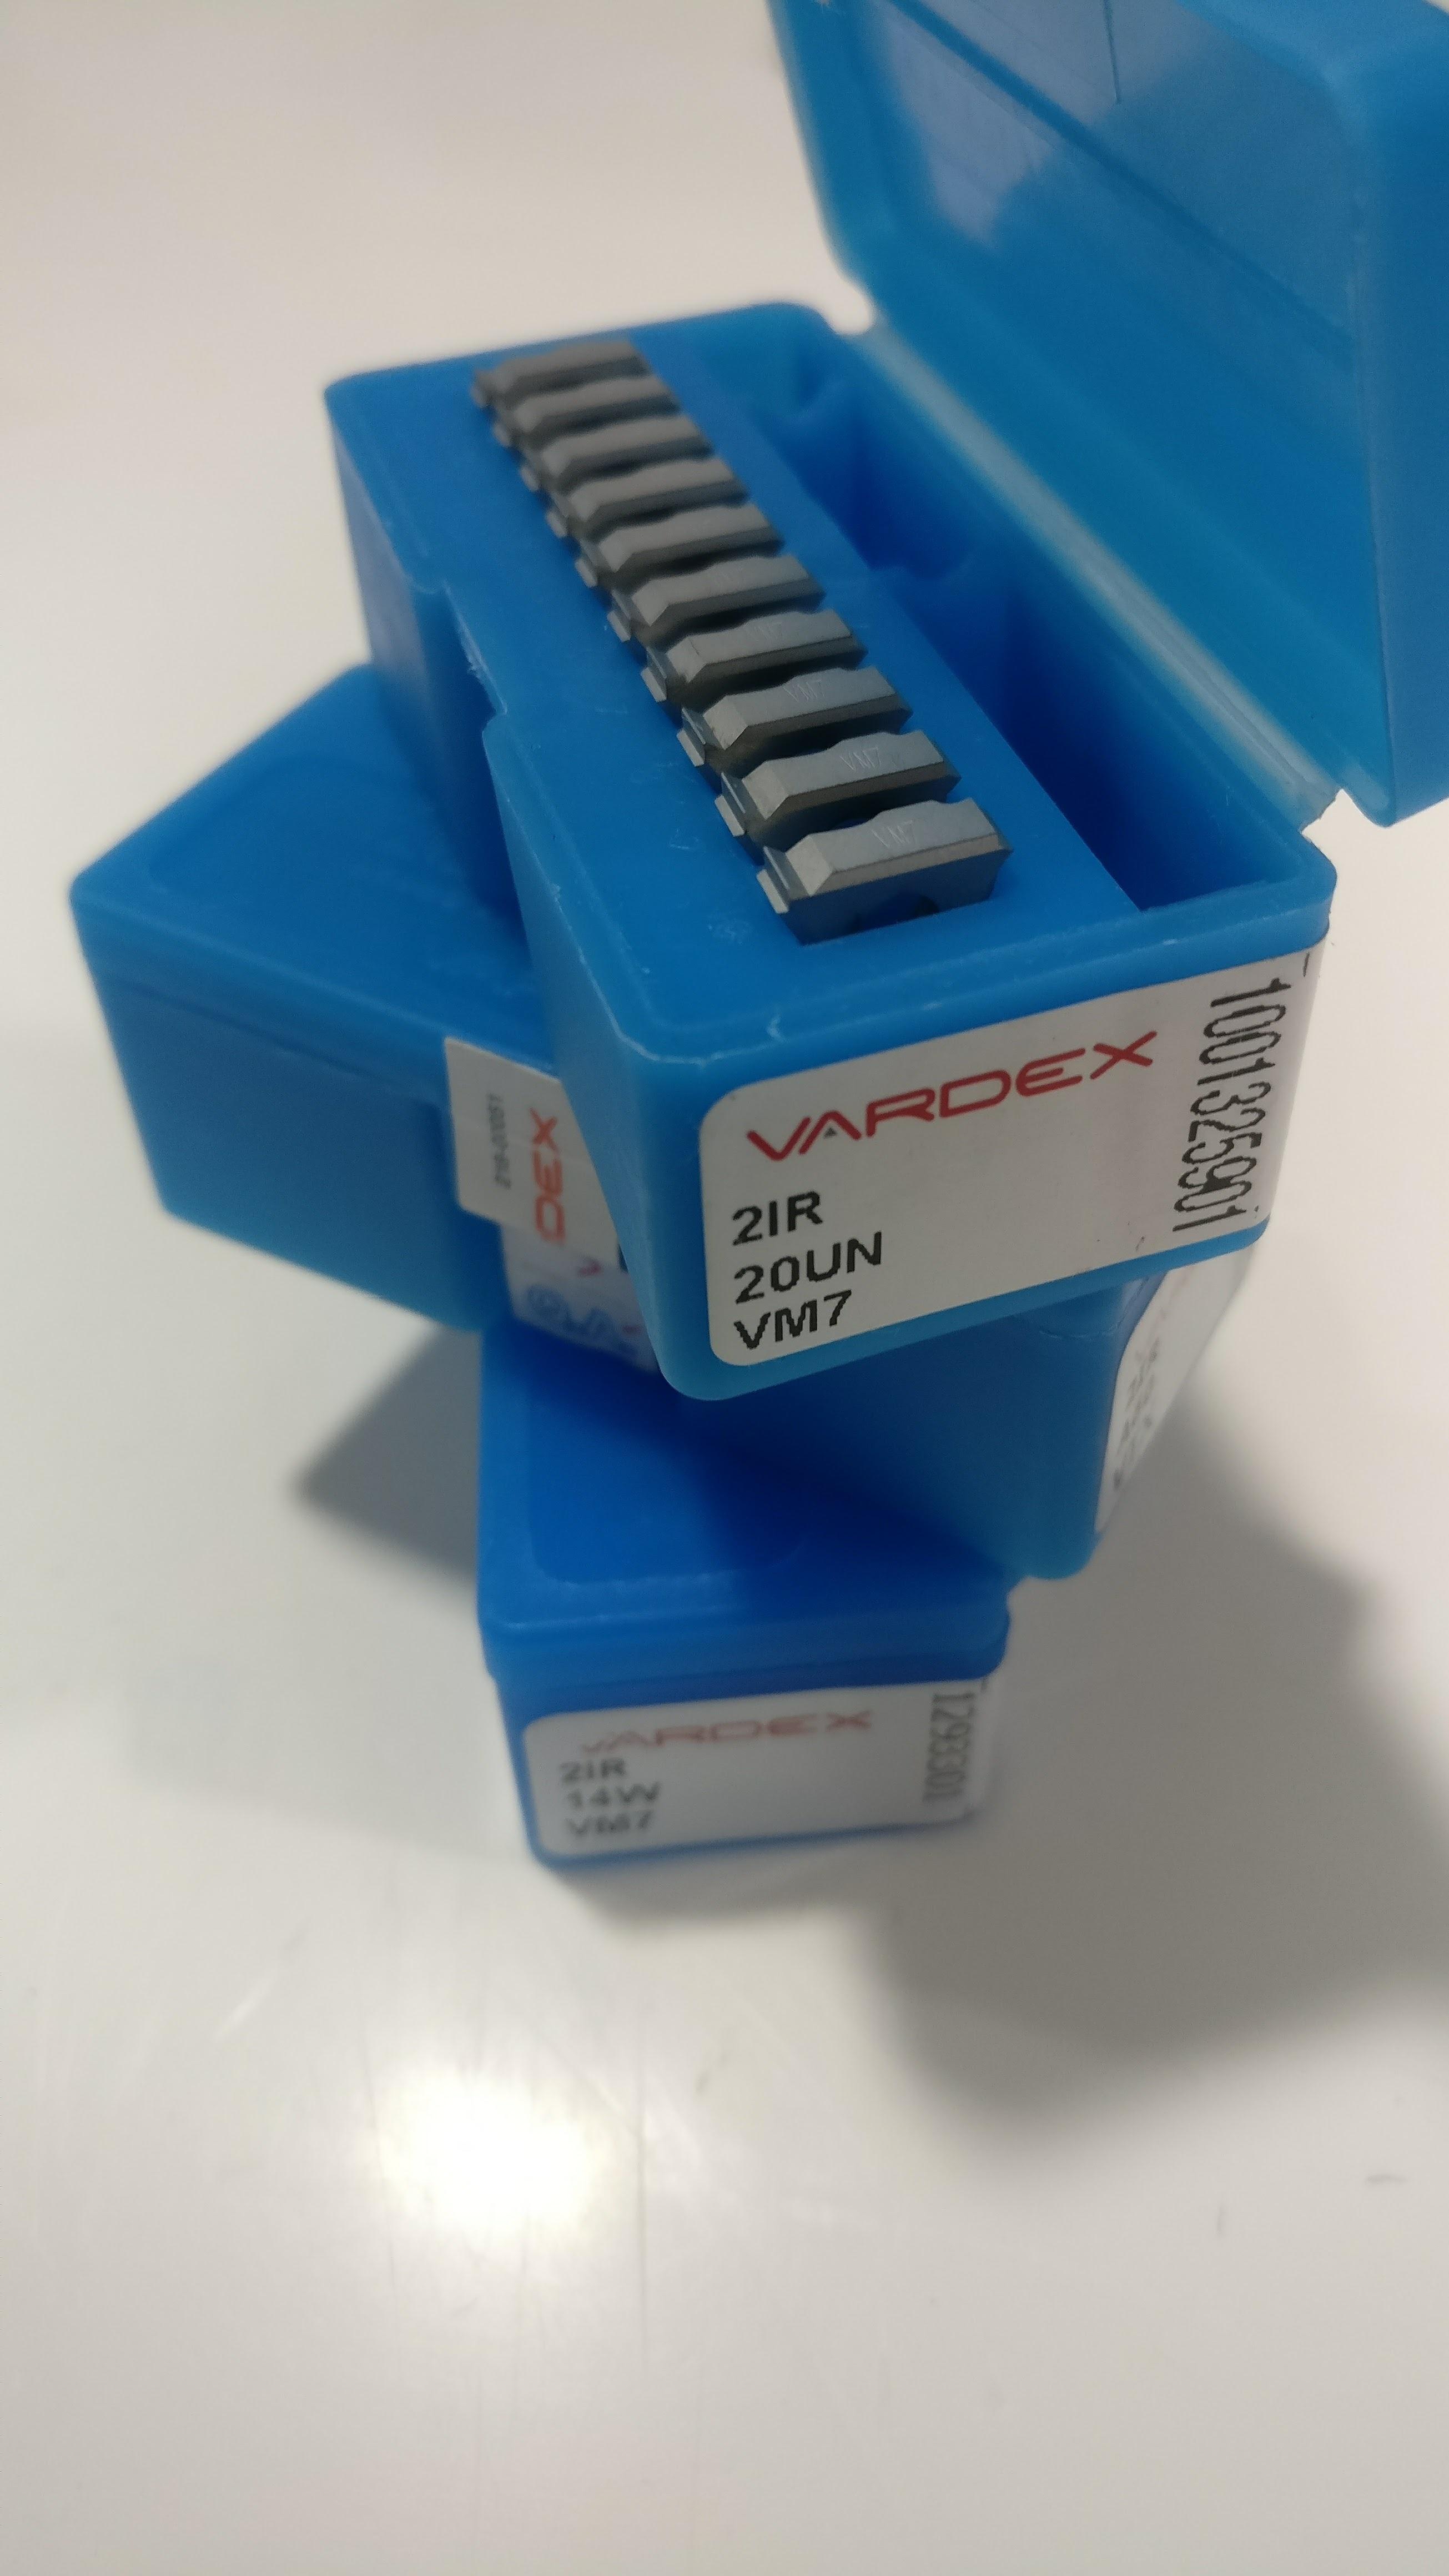 Vardex Threading Inserts